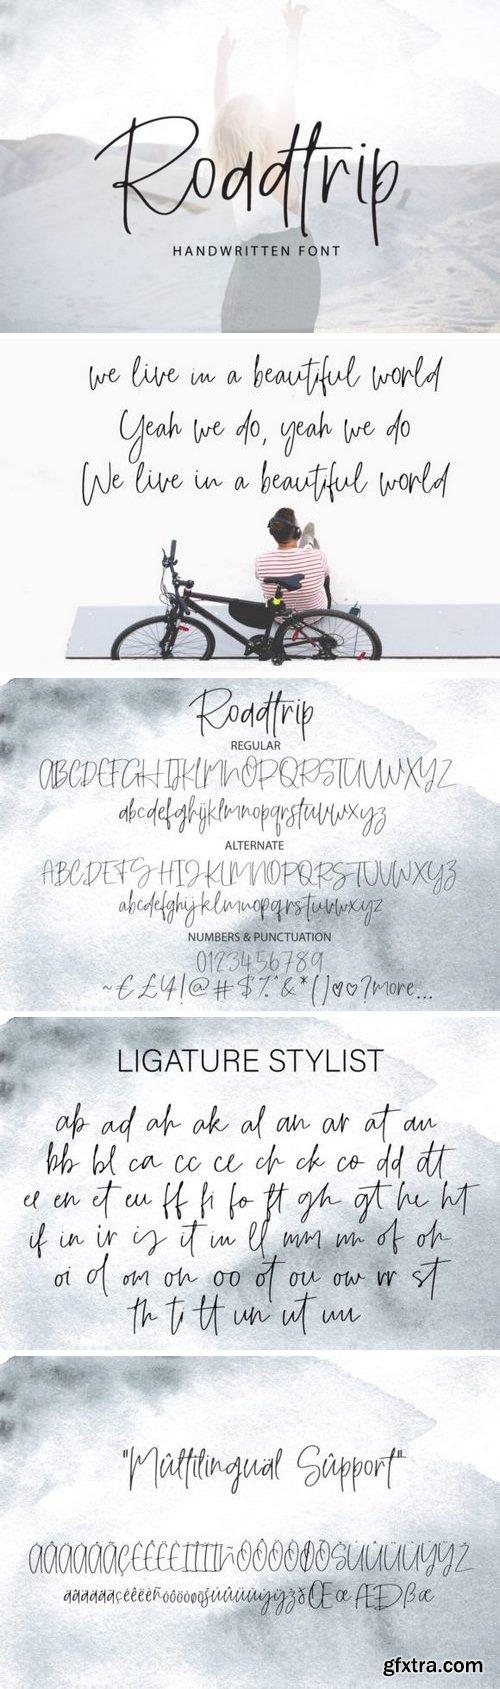 Roadtrip Font